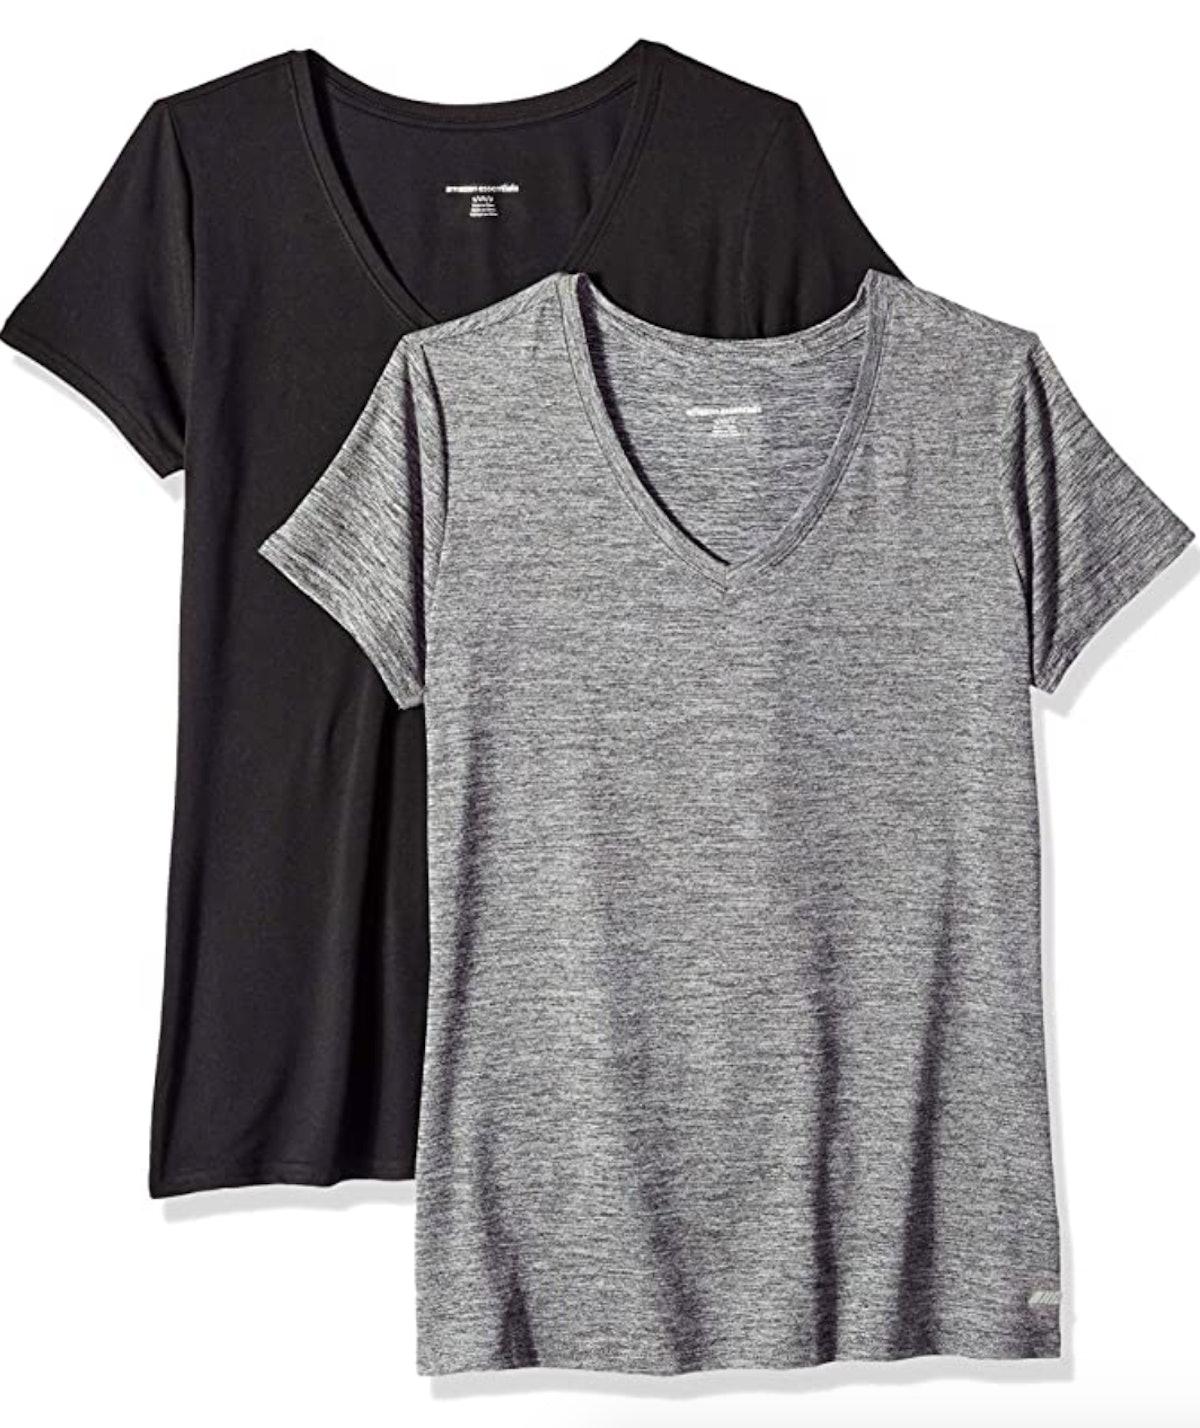 Amazon Essentials Tech Stretch Short-Sleeve T-Shirt